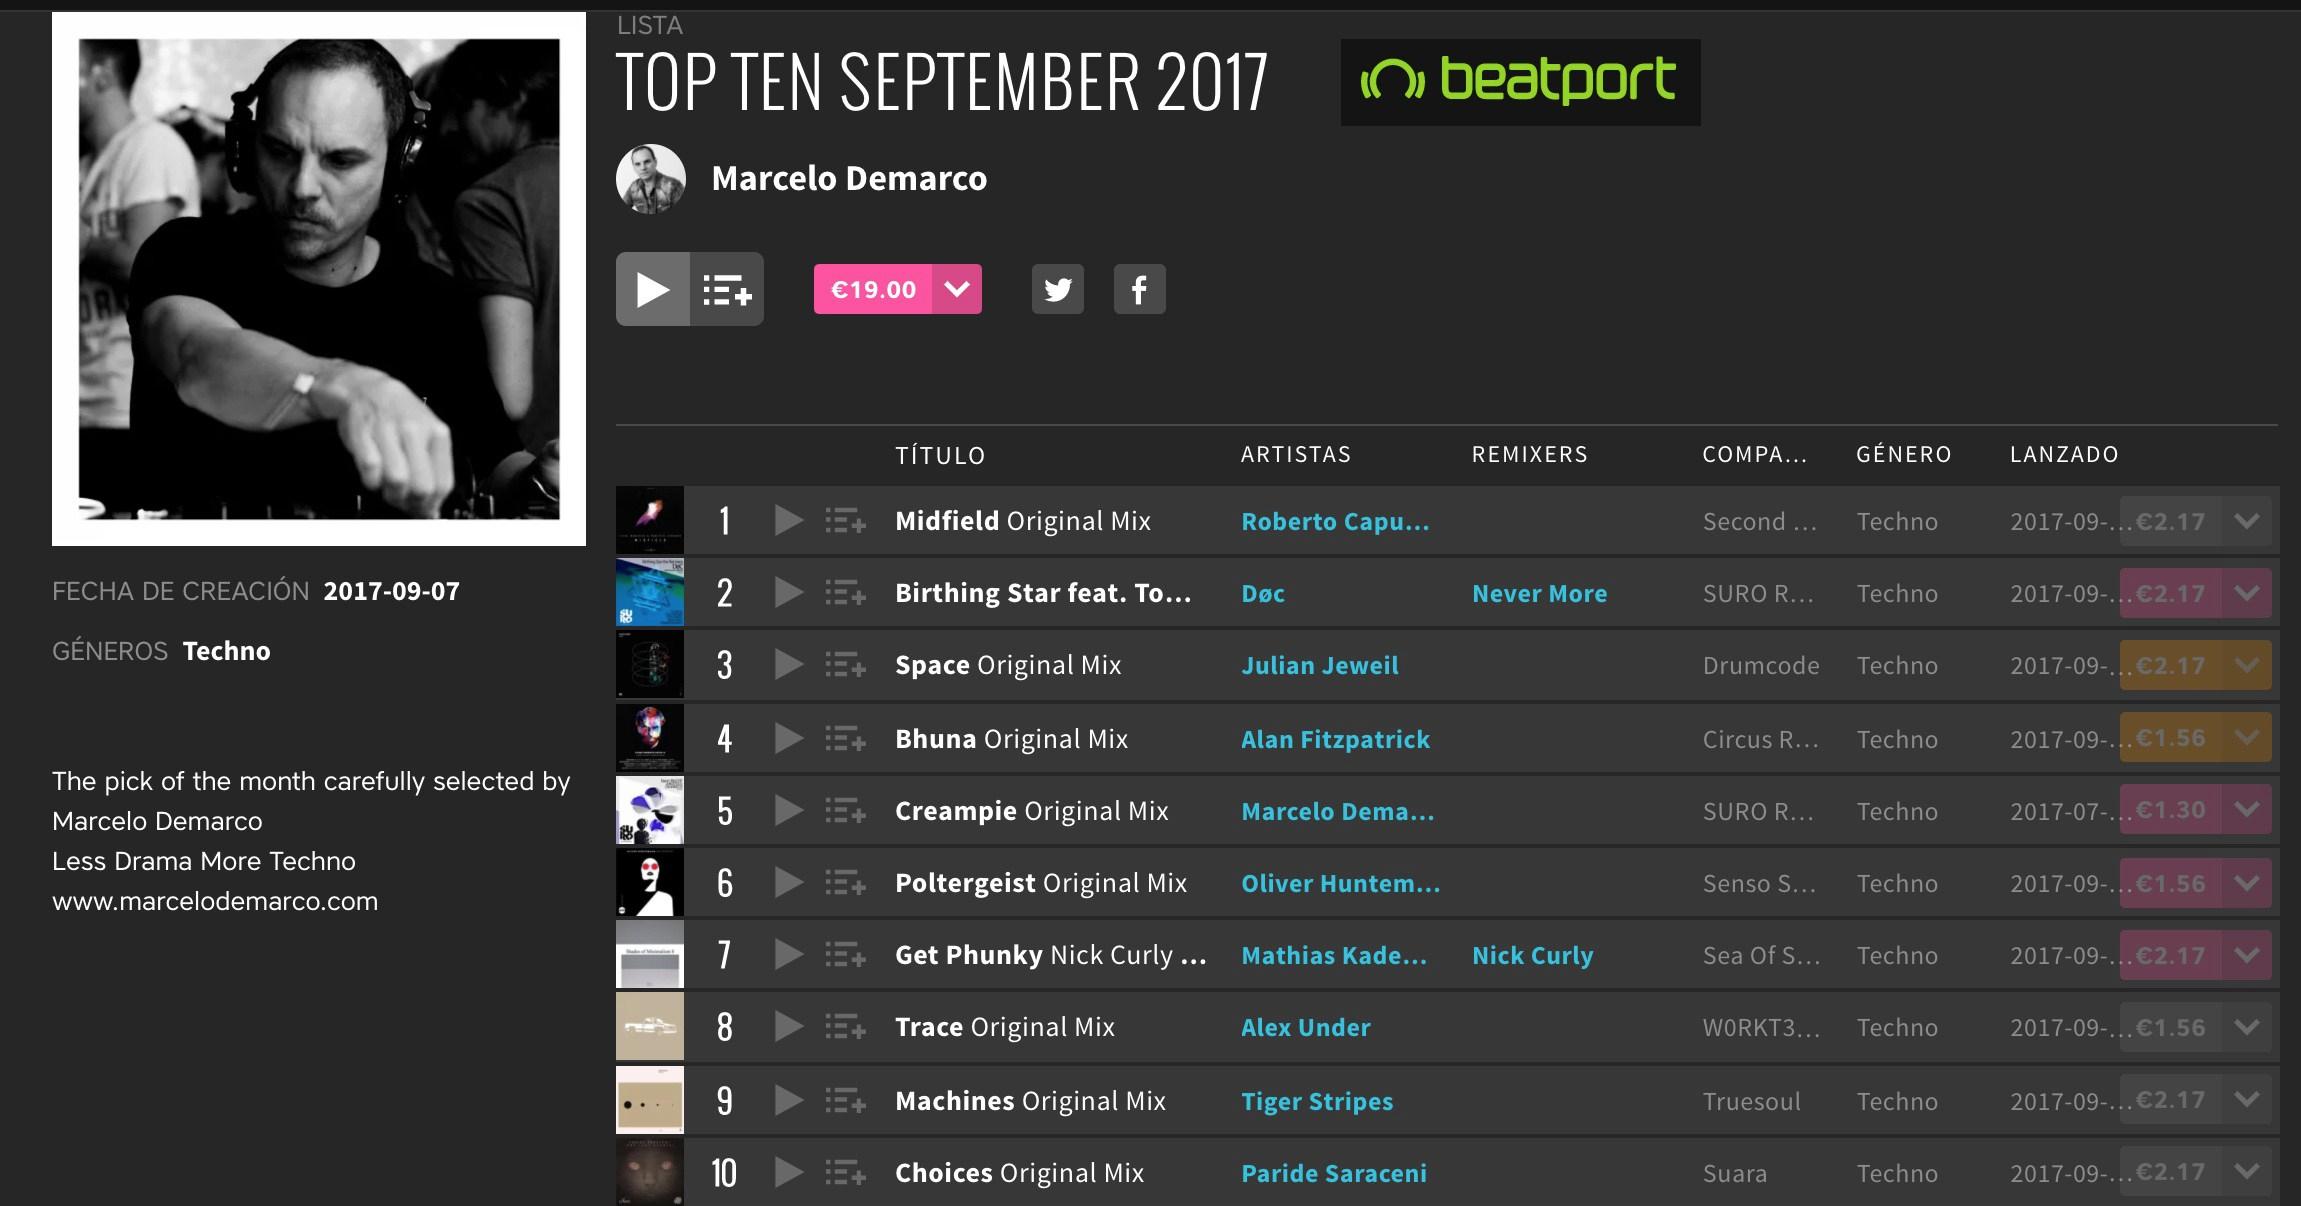 Top Ten September 2017